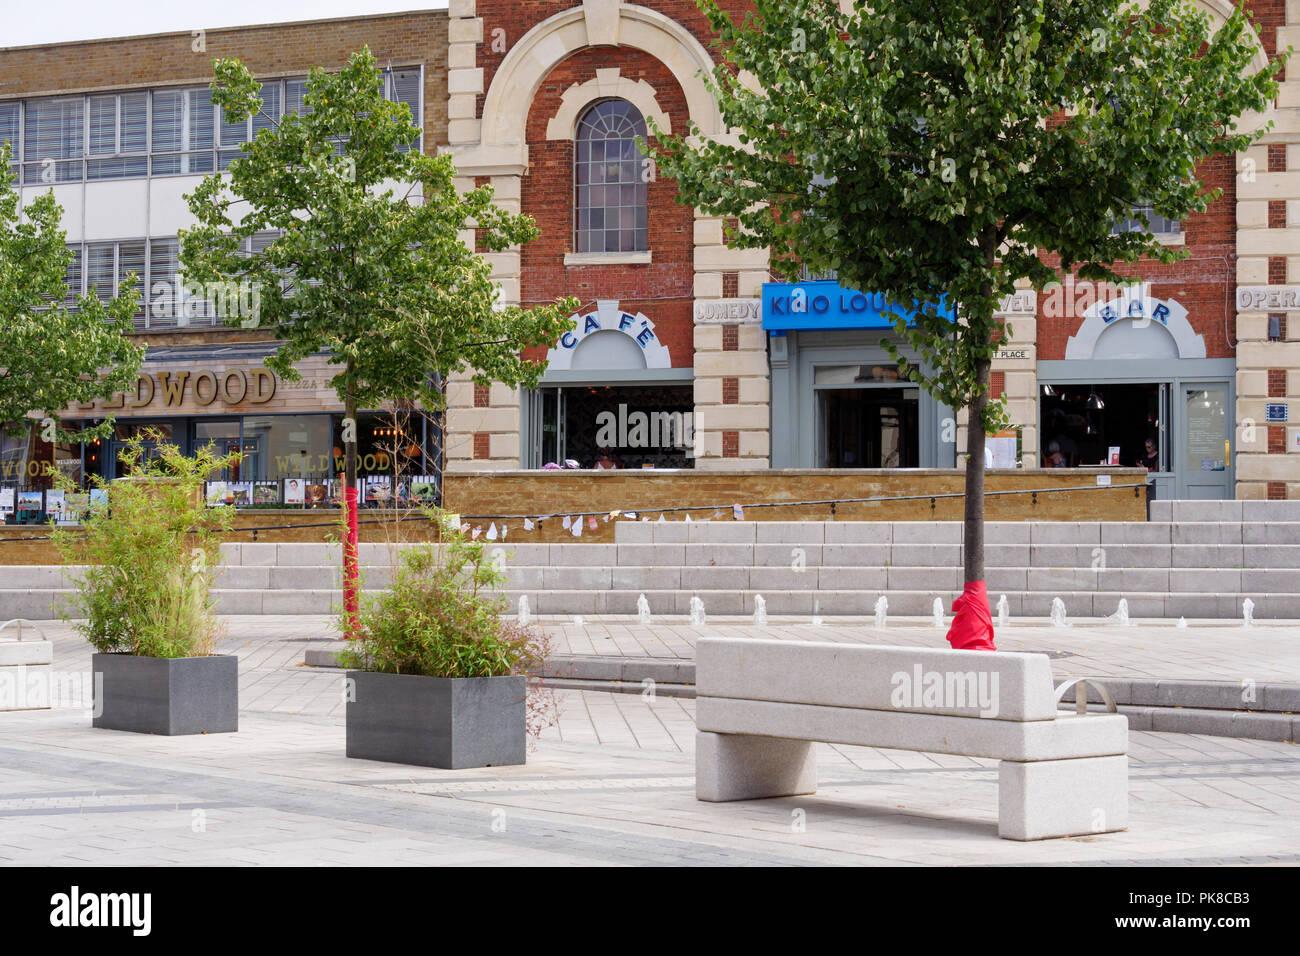 Corn Exchange Market Place Kettering Northamptonshire East Midlands England - Stock Image